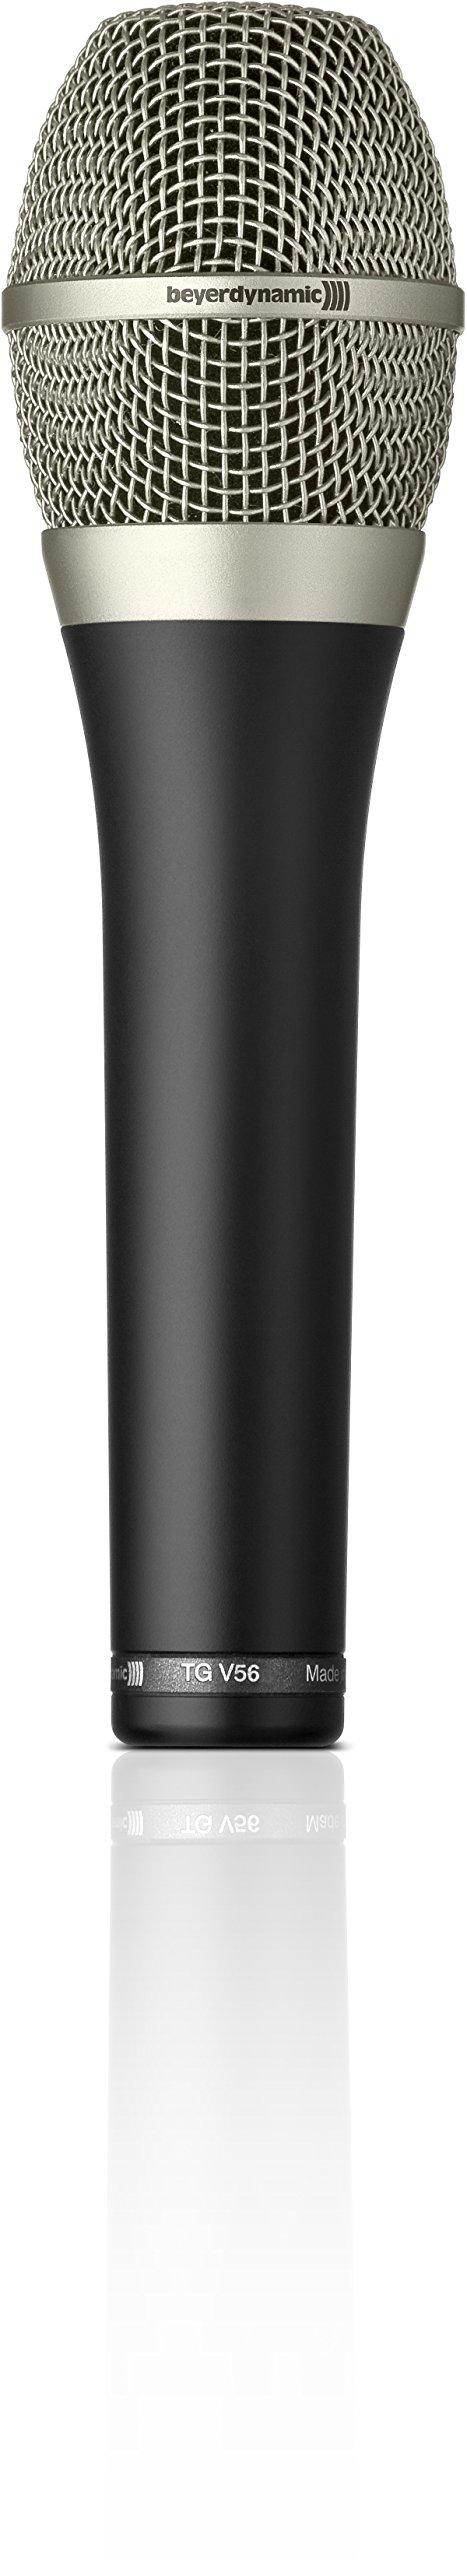 Microfono Beyerdynamic TG-V56C Electret Condenser Cardioi...